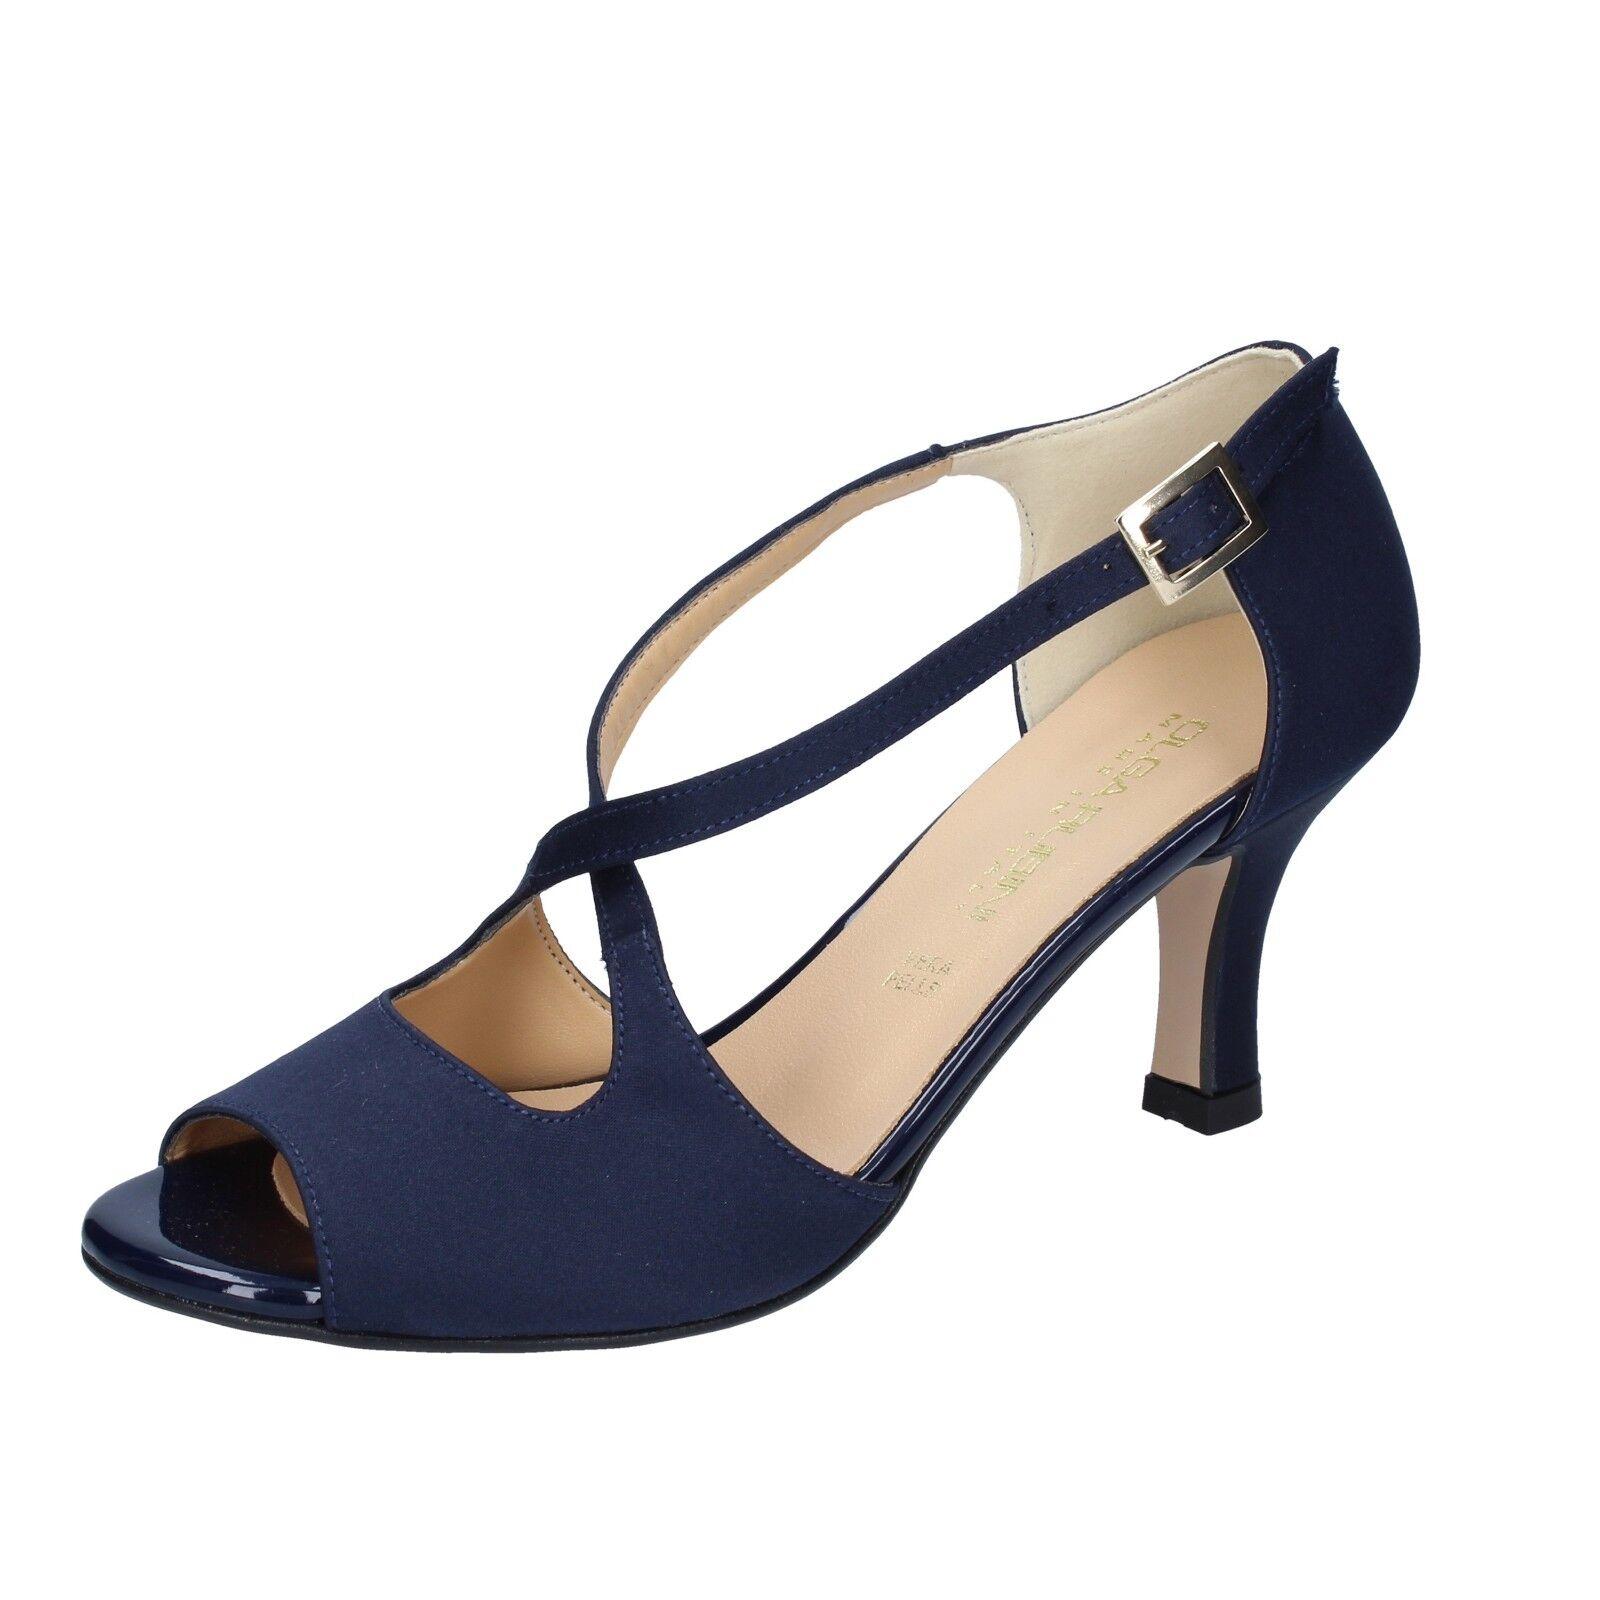 Women's shoes OLGA RUBINI 3 (EU 36) sandals bluee satin BS119-36